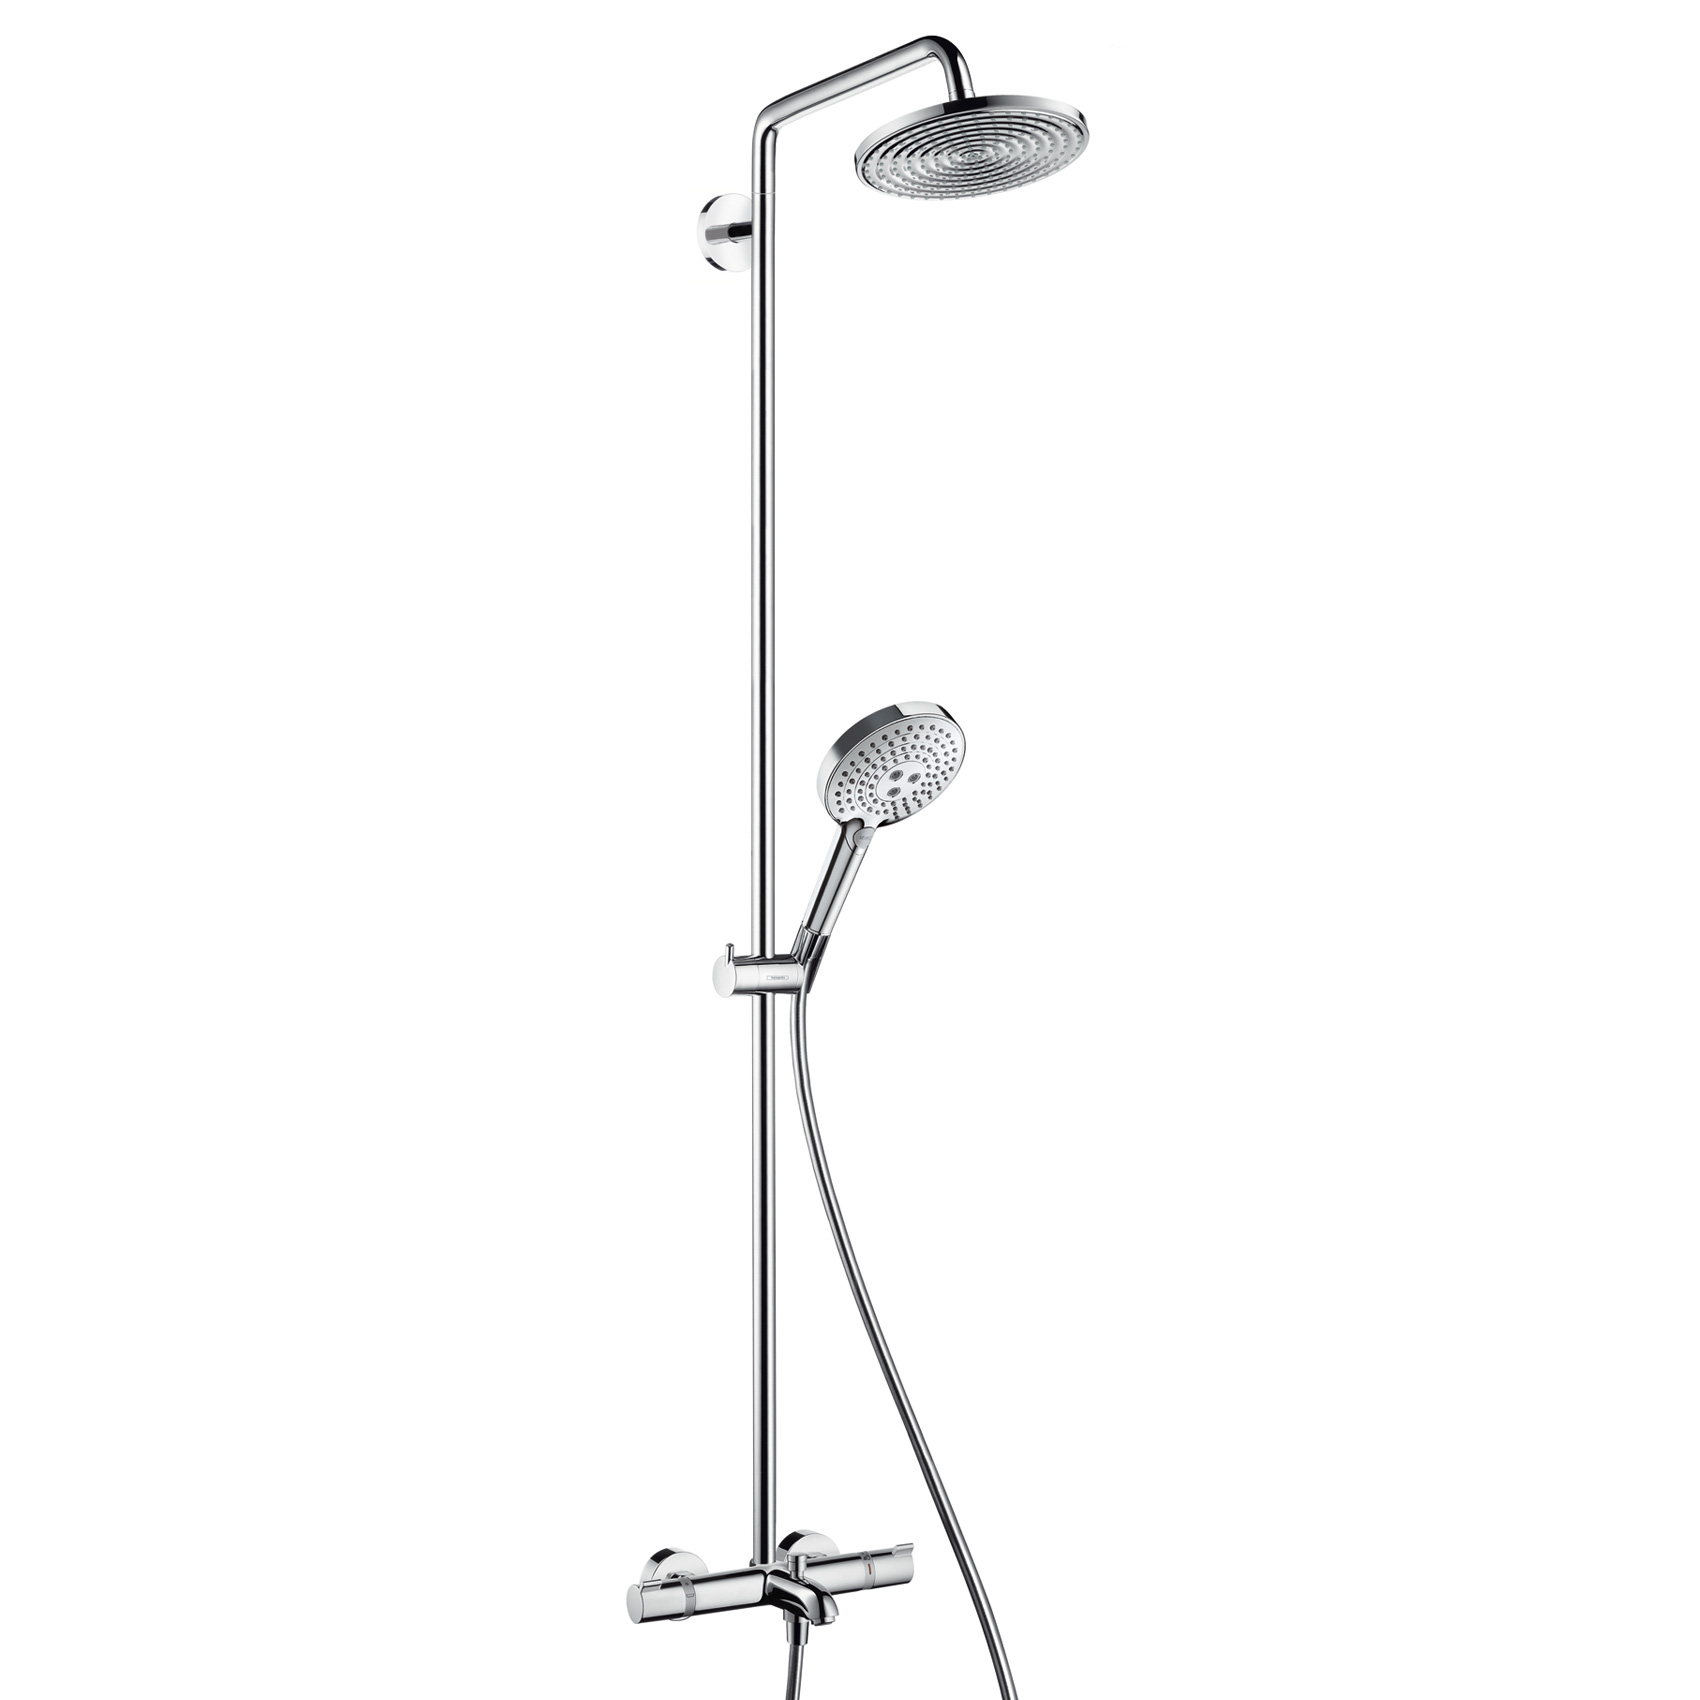 Bath Shower Mixer Thermostatic Hansgrohe Raindance Select S 240 1jet Showerpipe Wanne